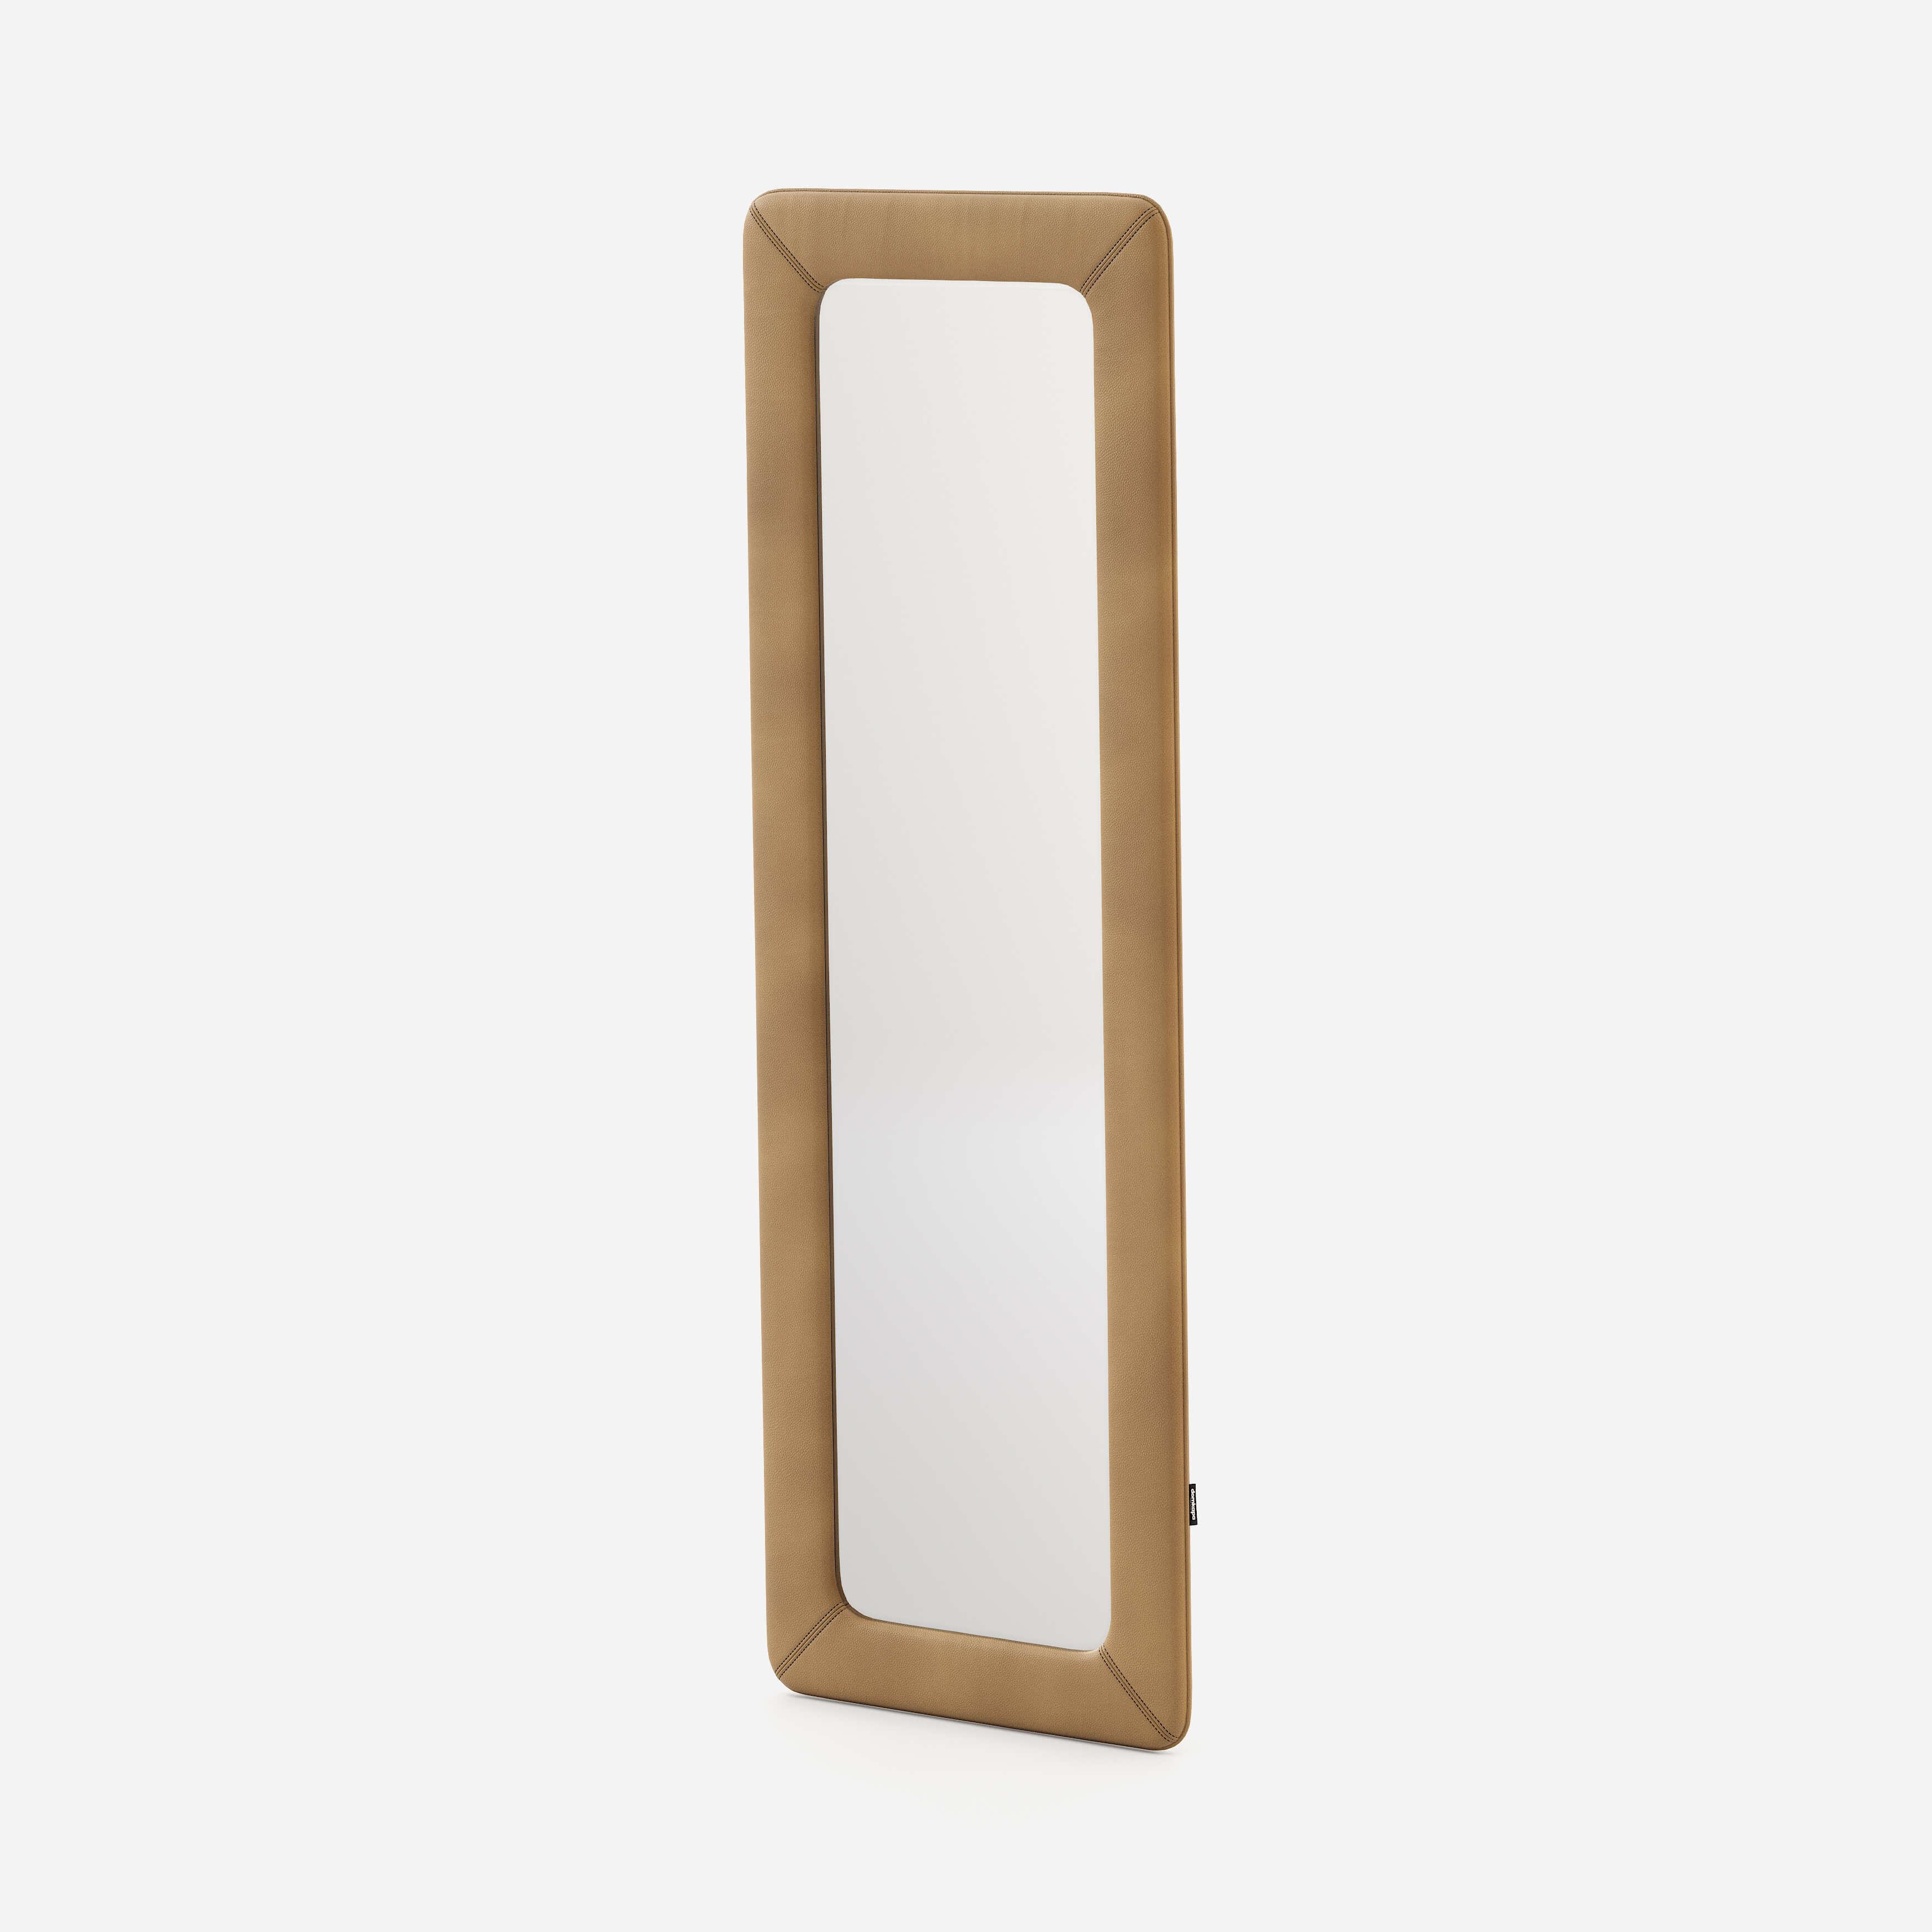 luana-mirror-living-room-bedroom-projects-interior-design-glass-velvet-domkapa-1